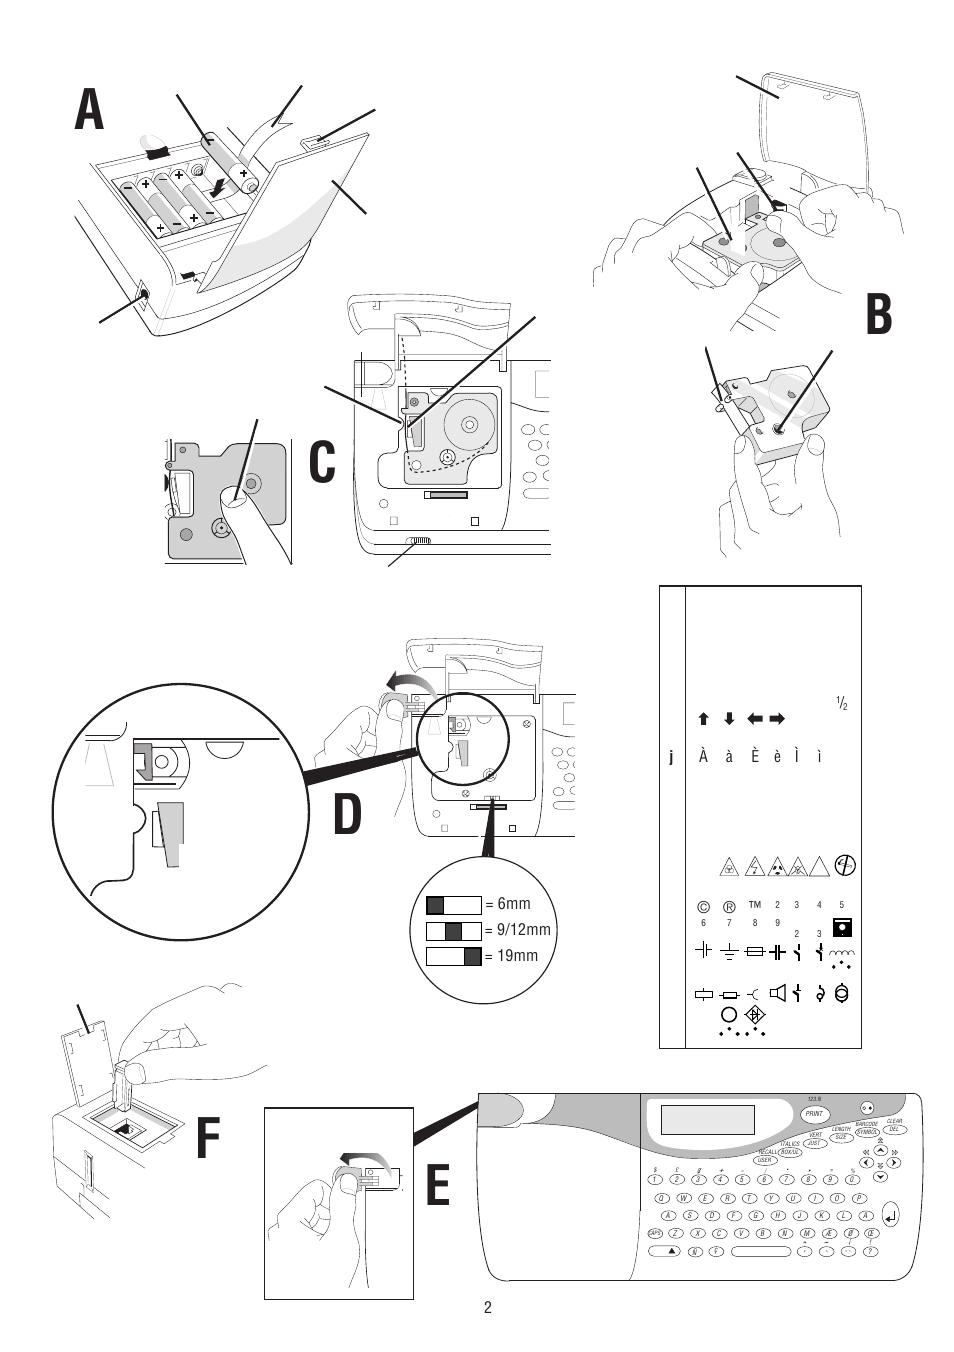 medium resolution of john deere la110 wiring diagram john deere la125 wiring john deere la125 motor john deere la135